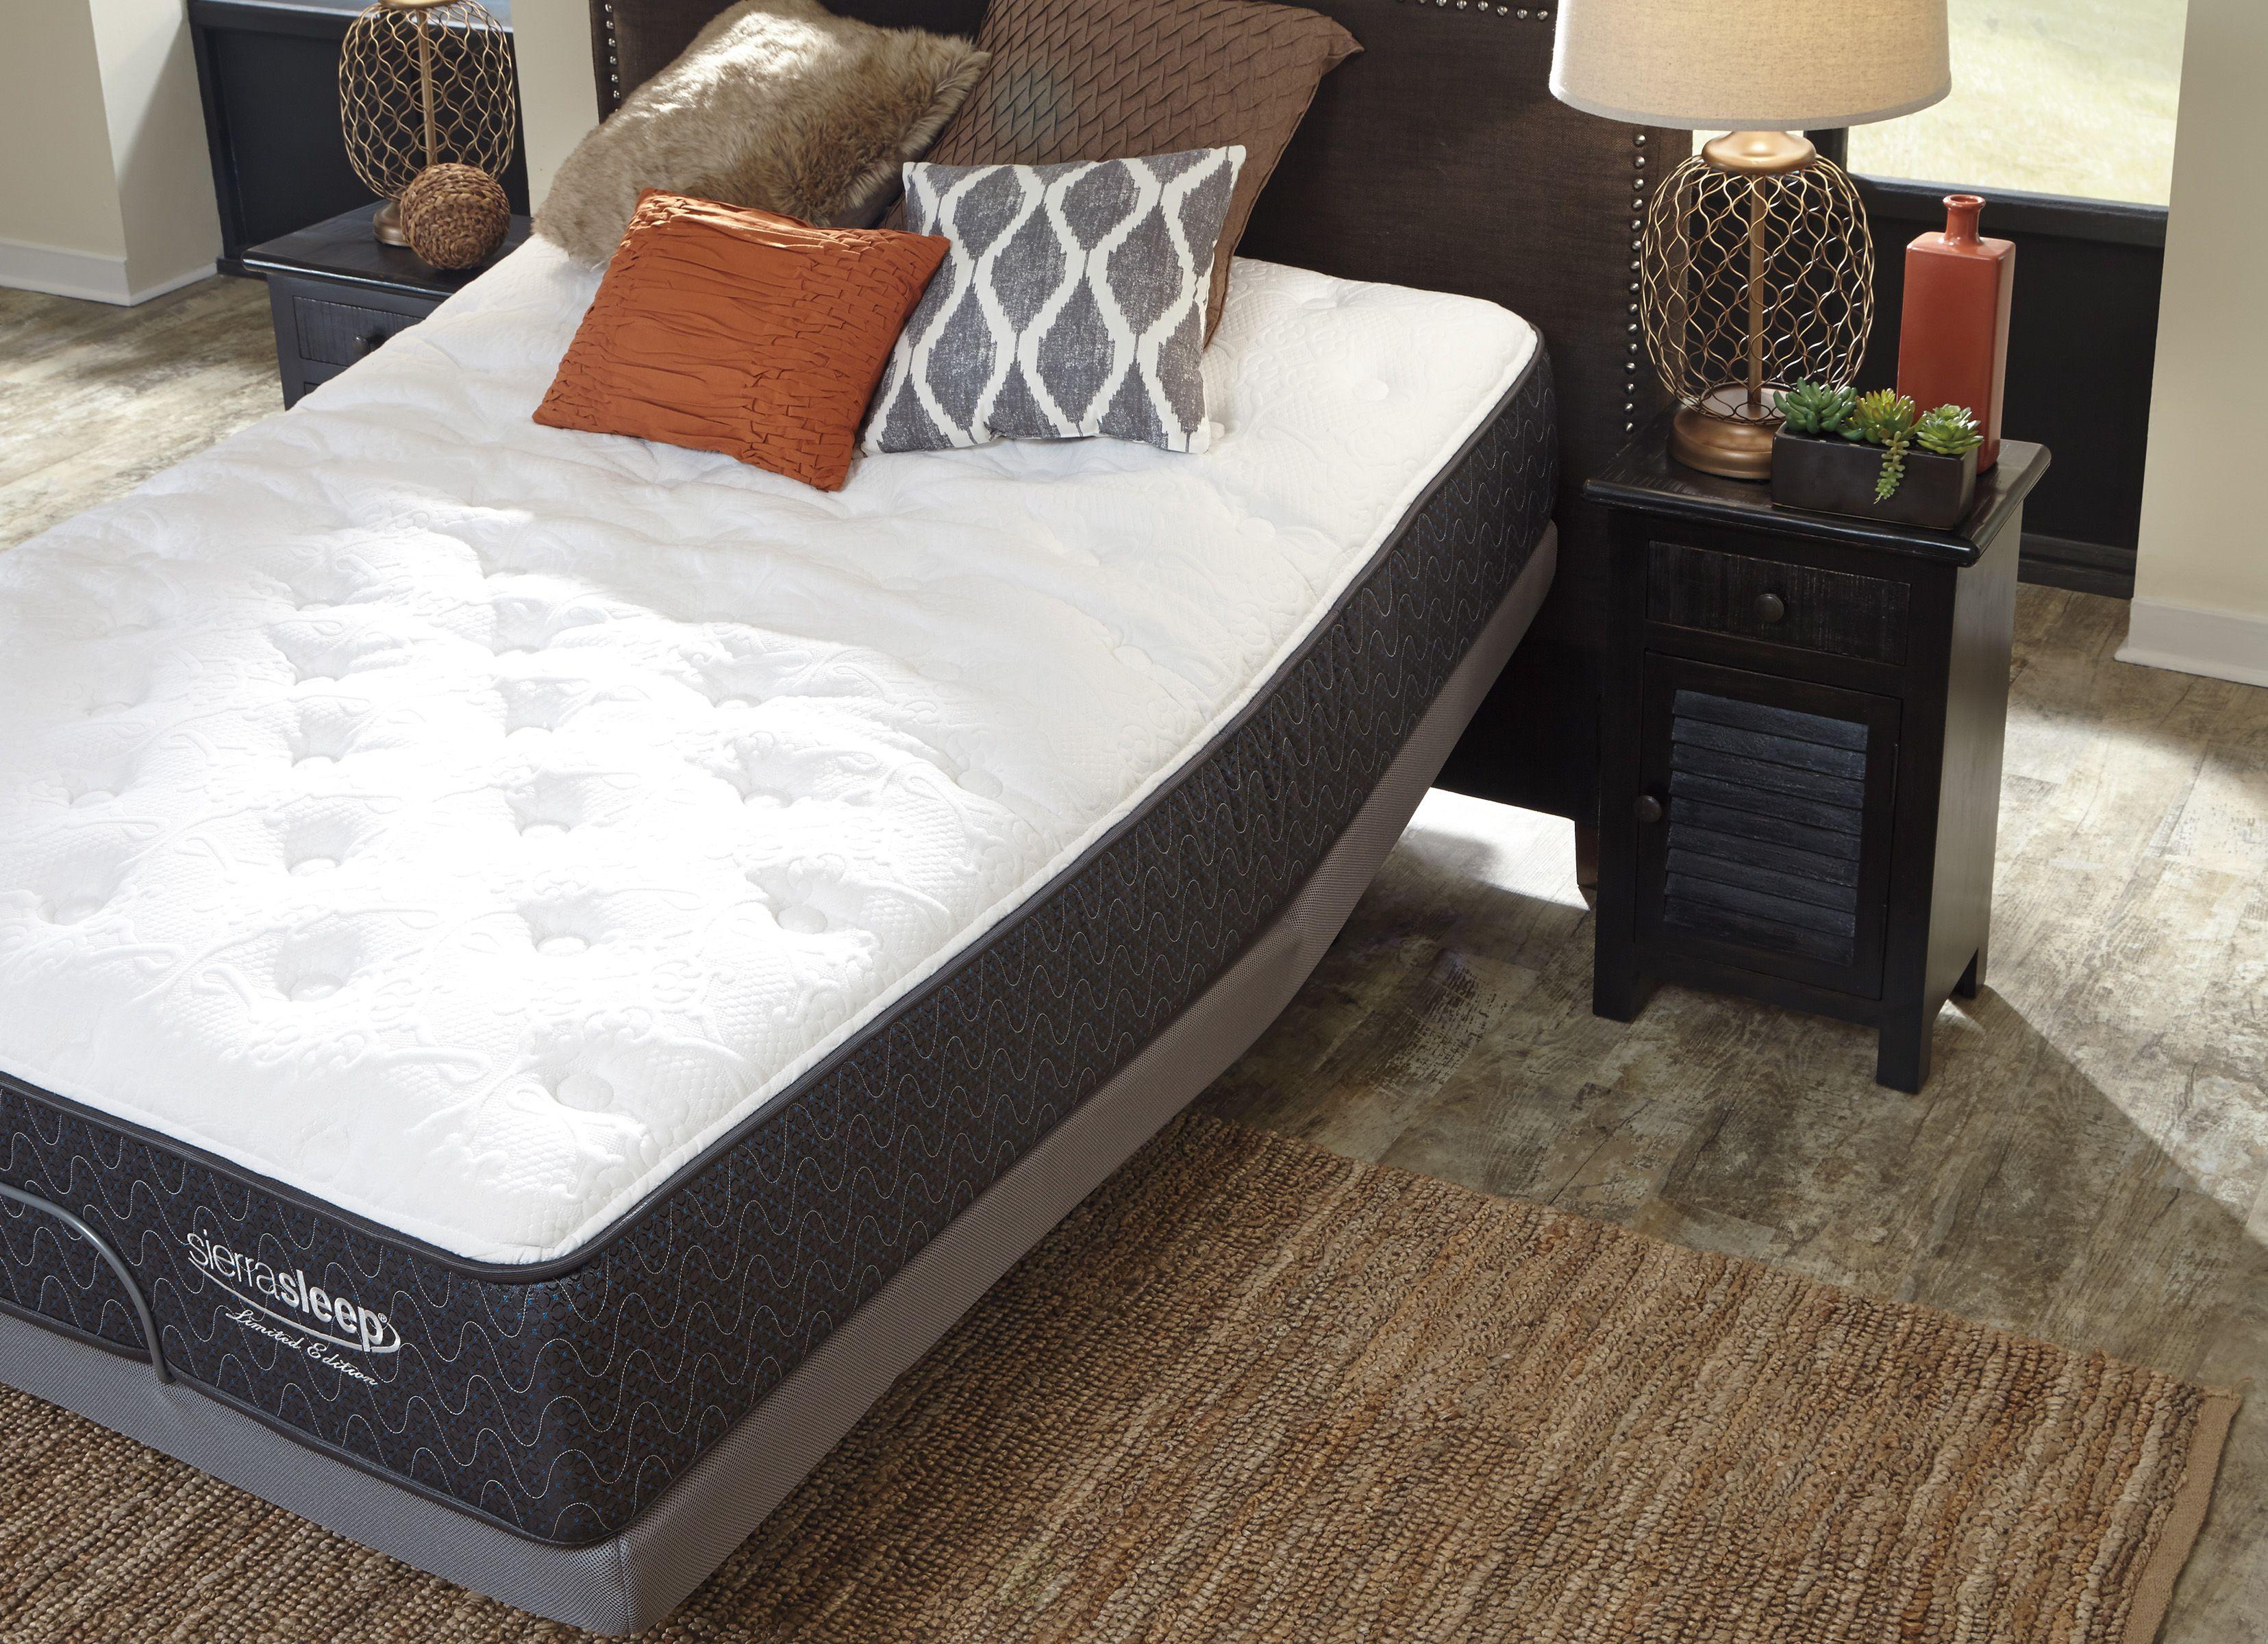 Adjustable Base AND Mattress Mattress, Cool furniture